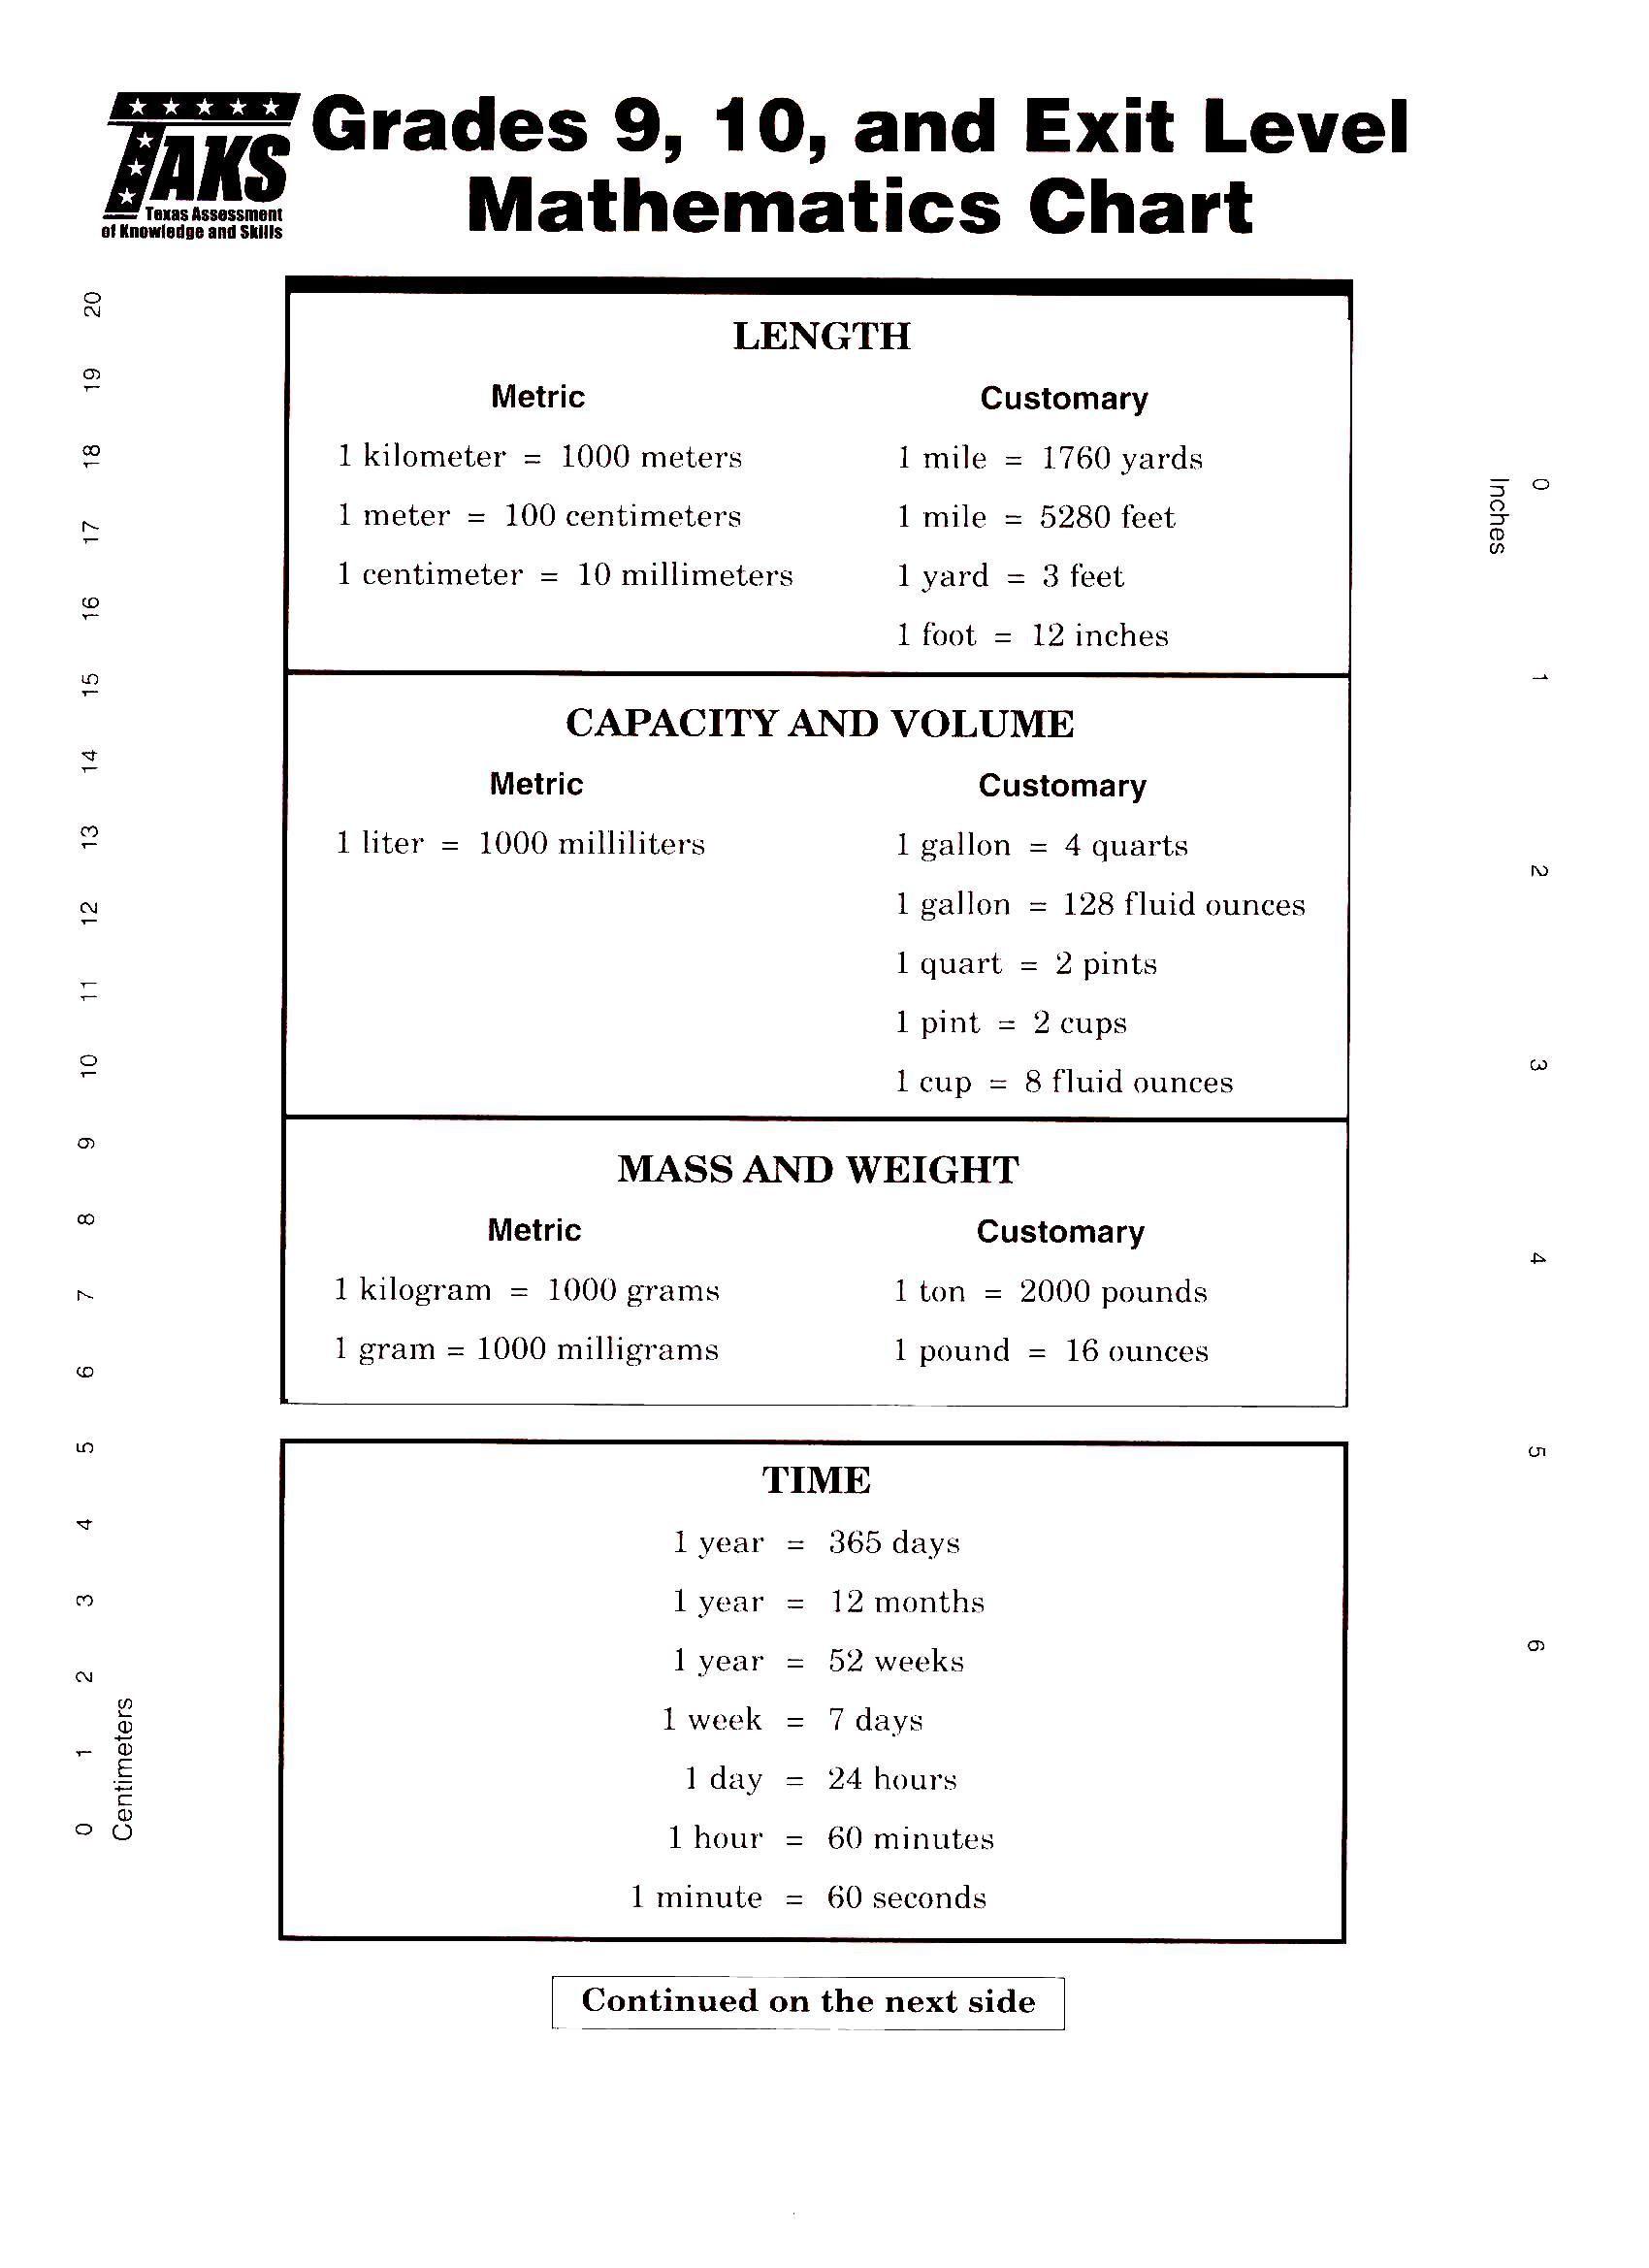 Basic Math Formulas Chart